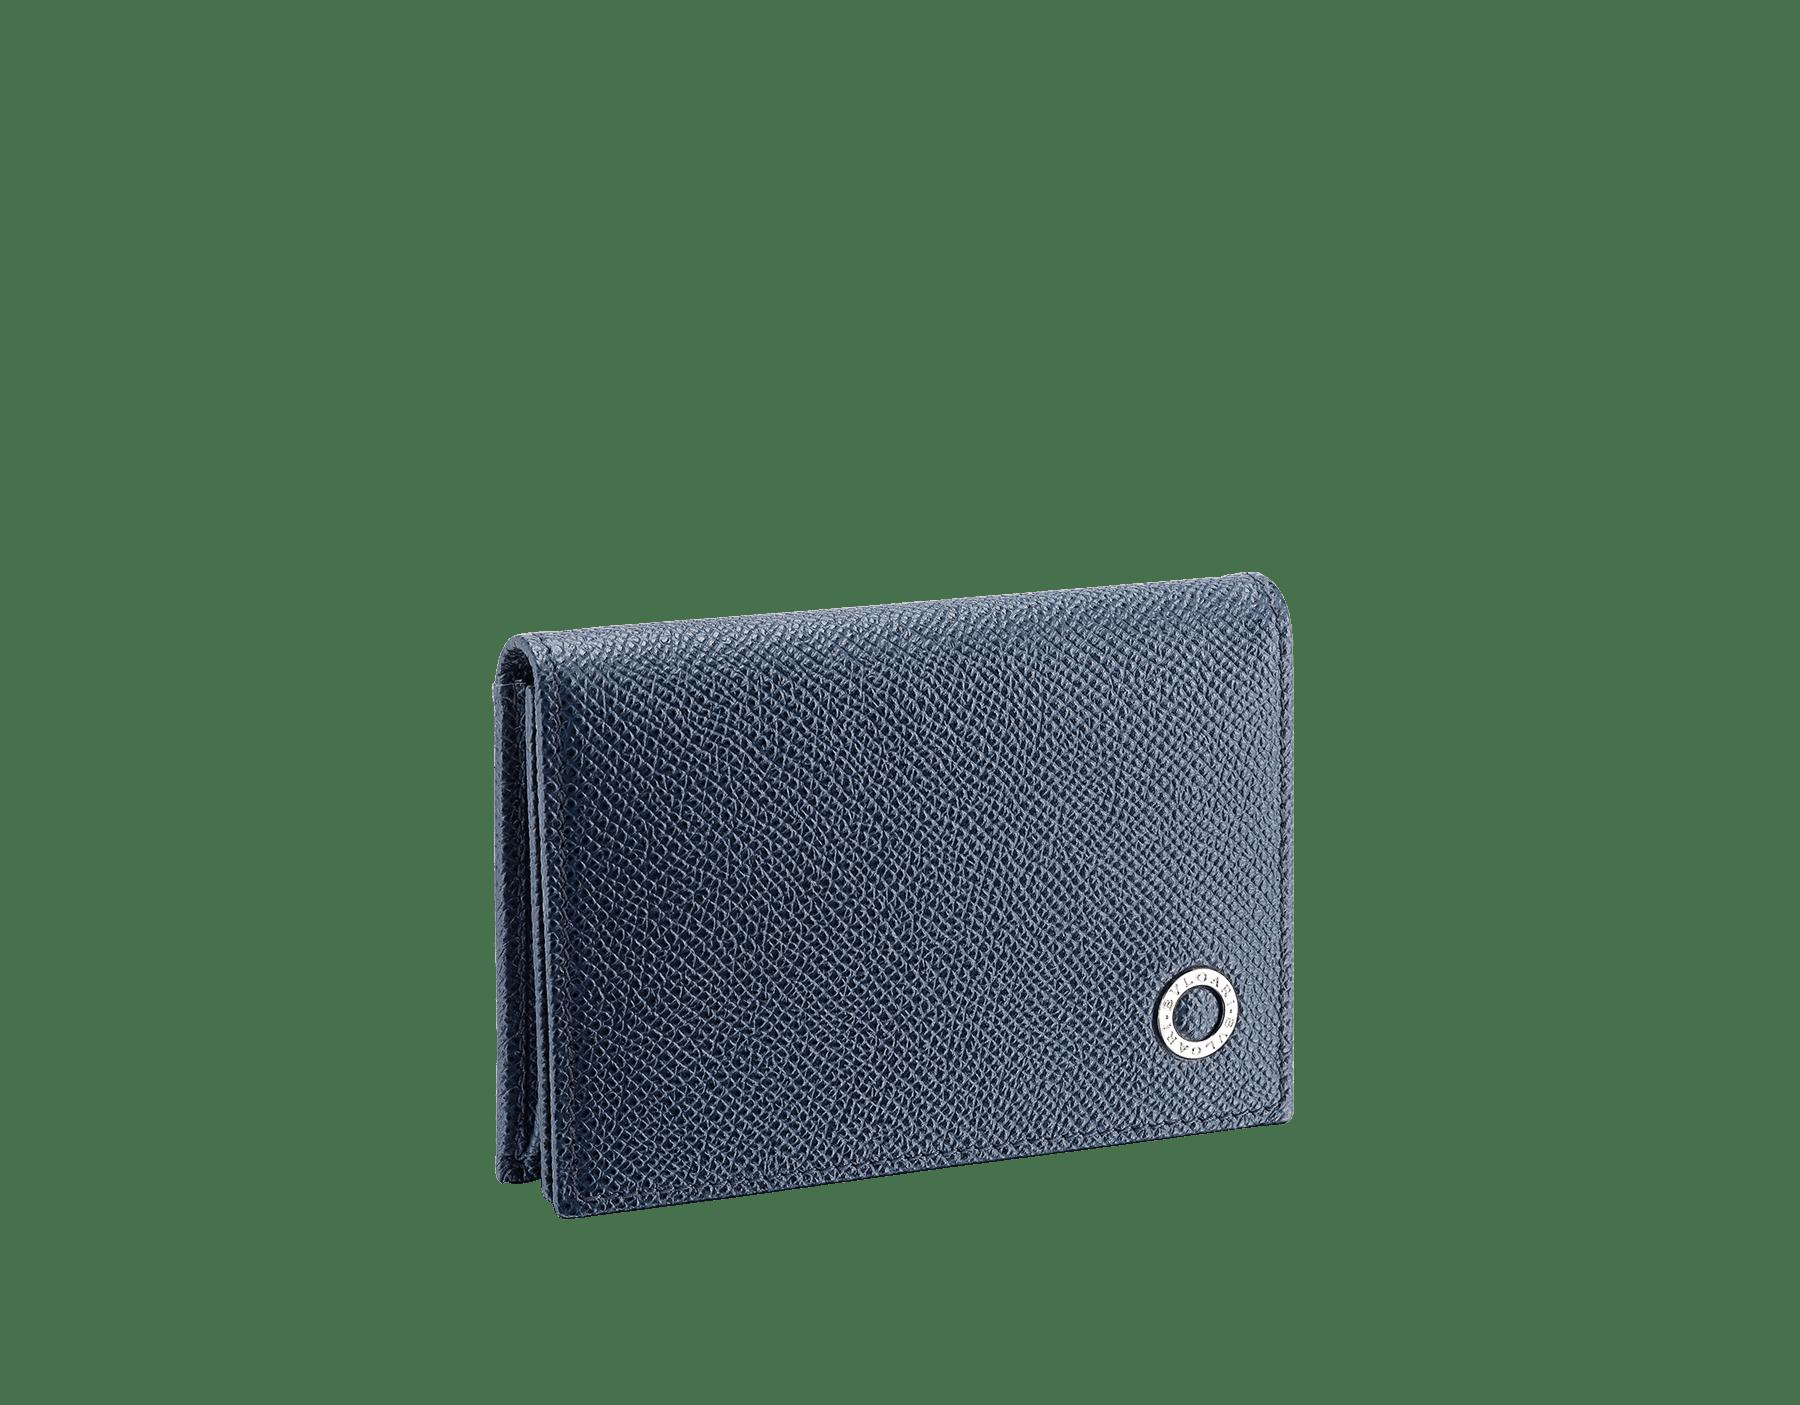 BVLGARI BVLGARI business card holder in denim sapphire and charcoal diamond grain calf leather, with brass palladium plated logo decoration. 289116 image 1